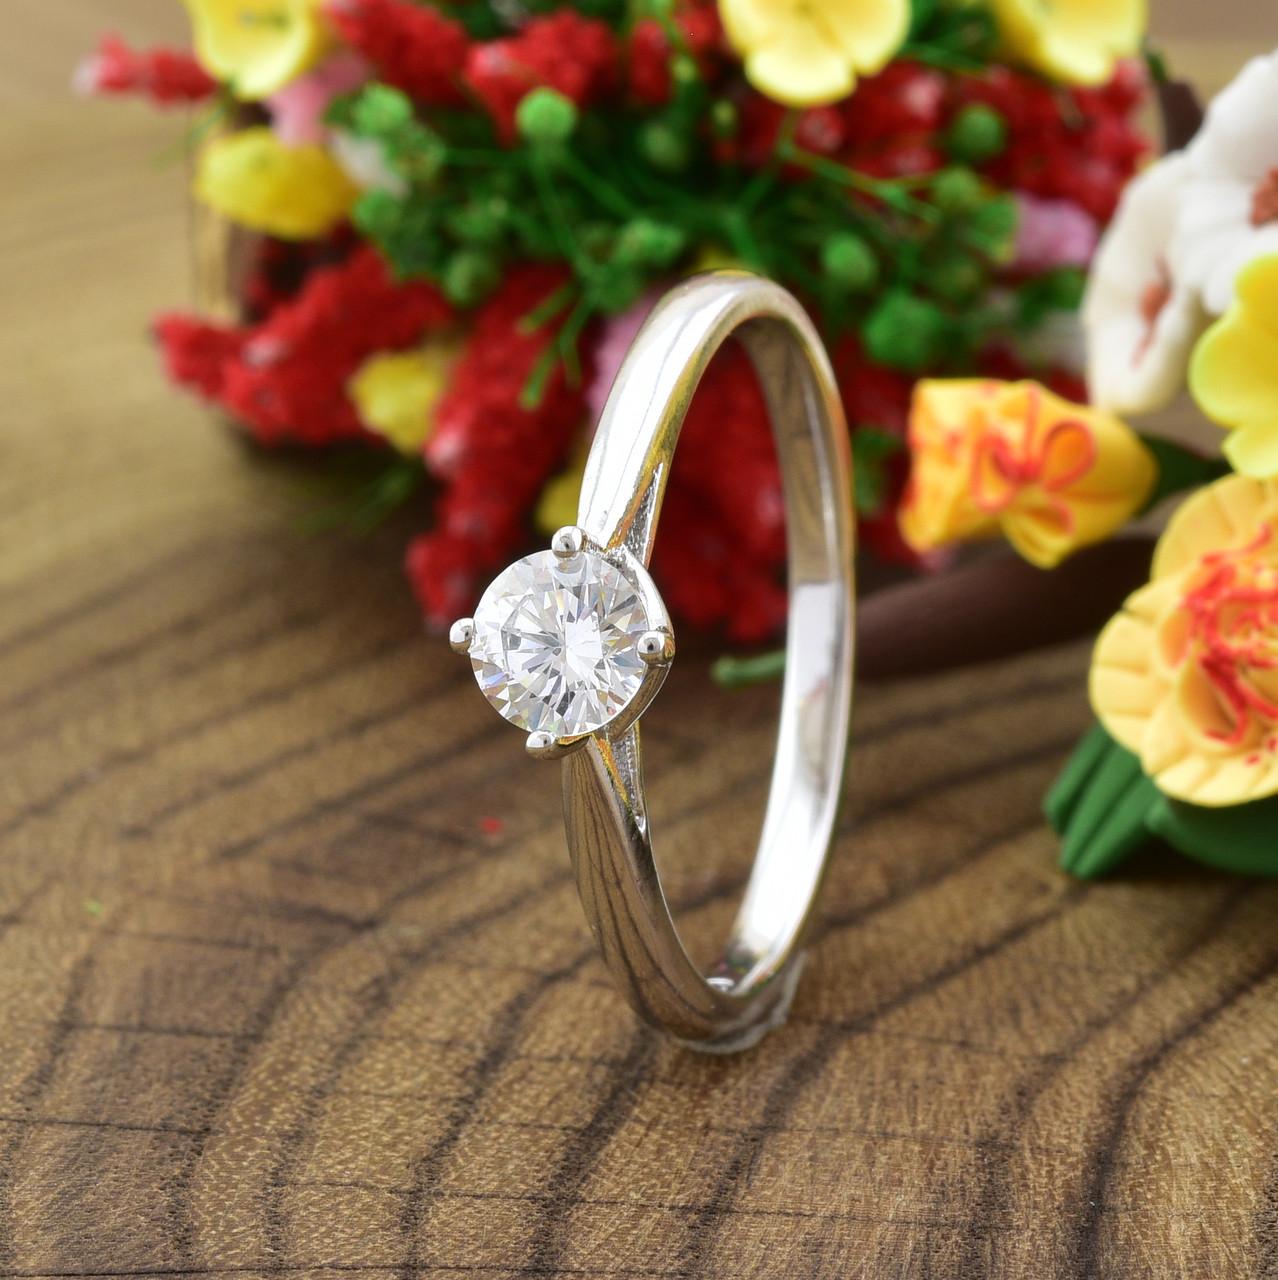 Кольцо Xuping 14283 размер 19 ширина 6 мм вес 1.8 г белые фианиты позолота БЗ